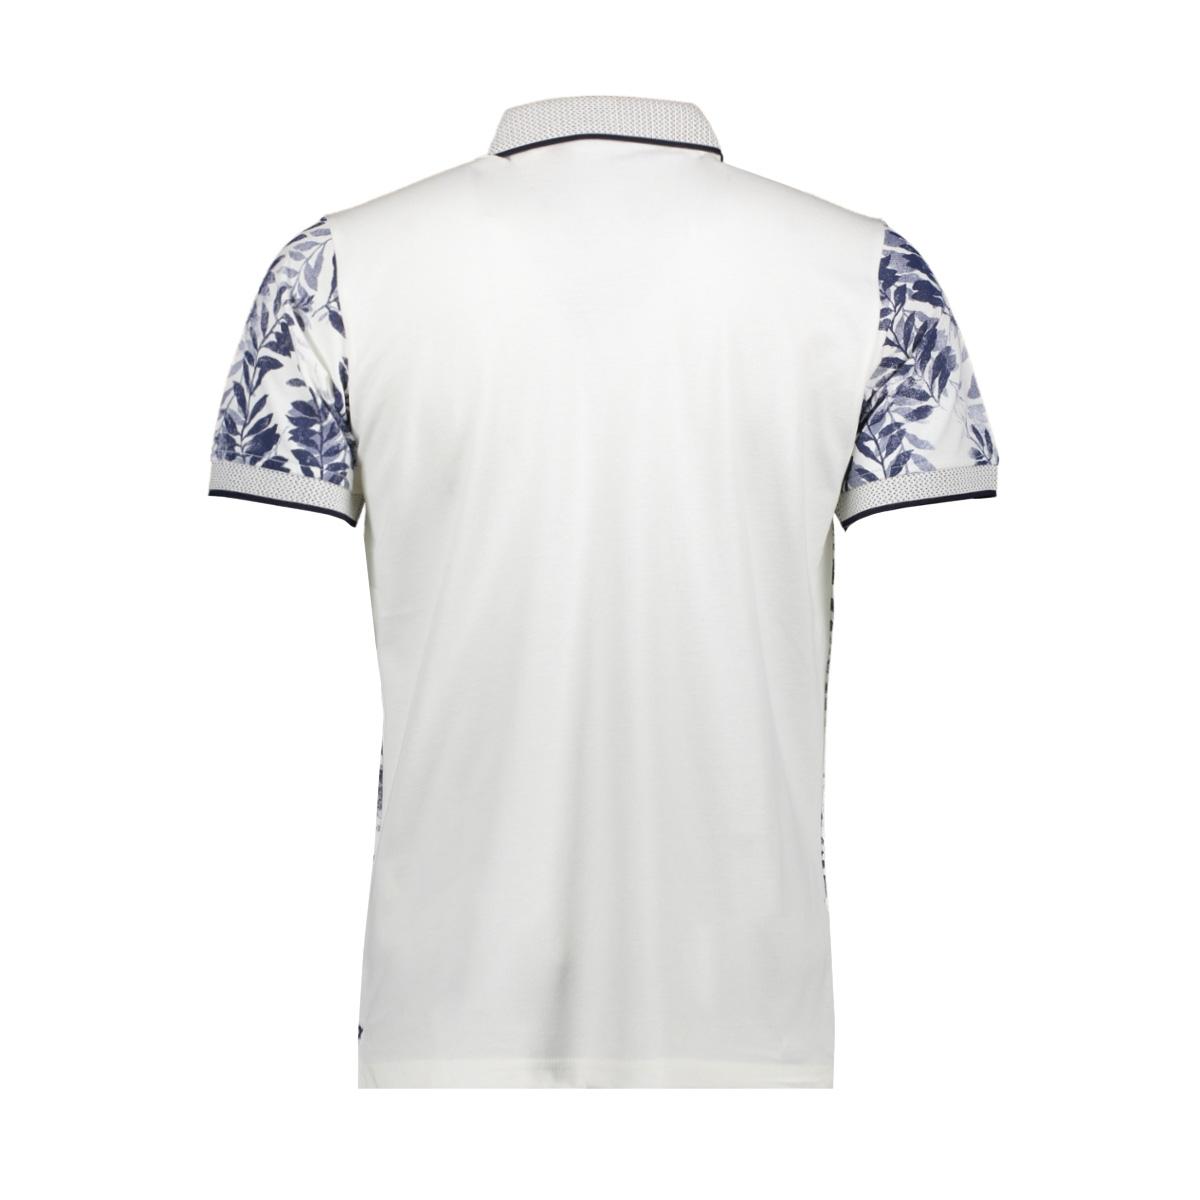 polo shirt 22131 gabbiano polo ecru